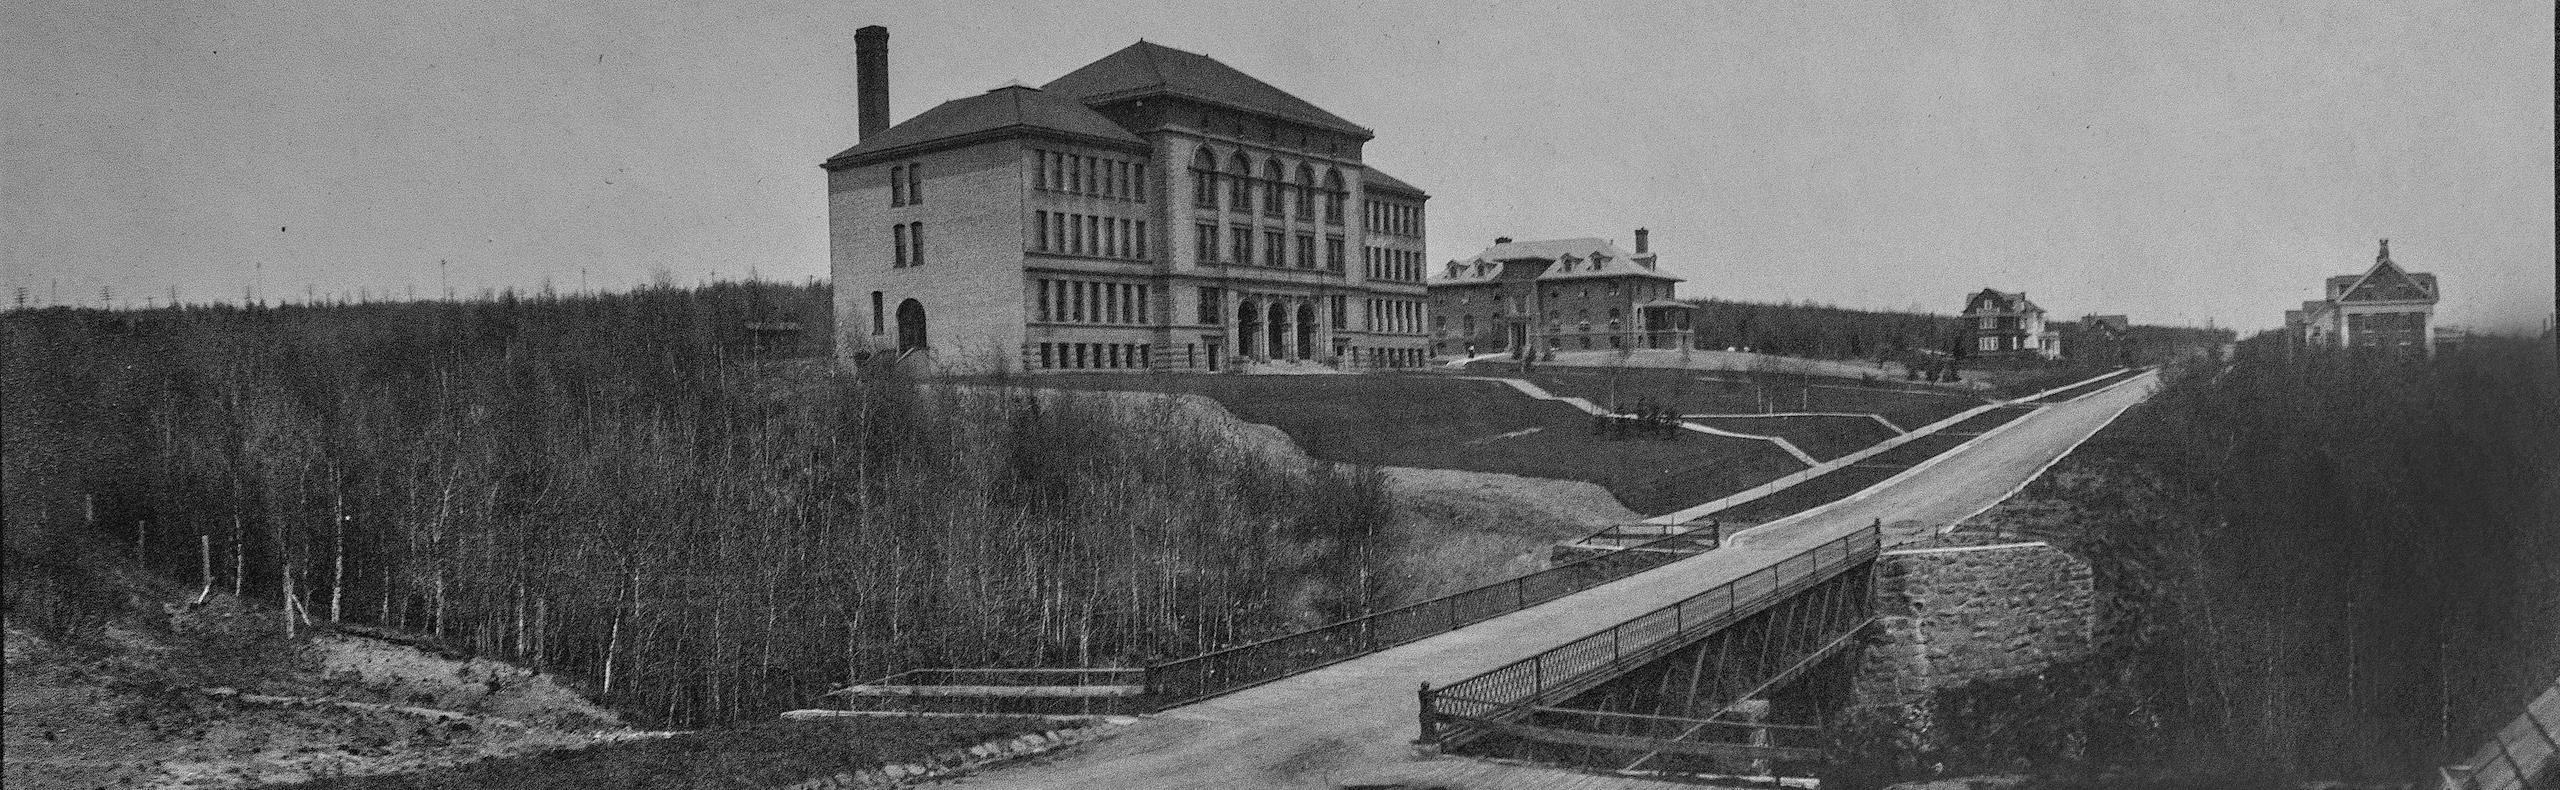 Duluth Normal School in 1907